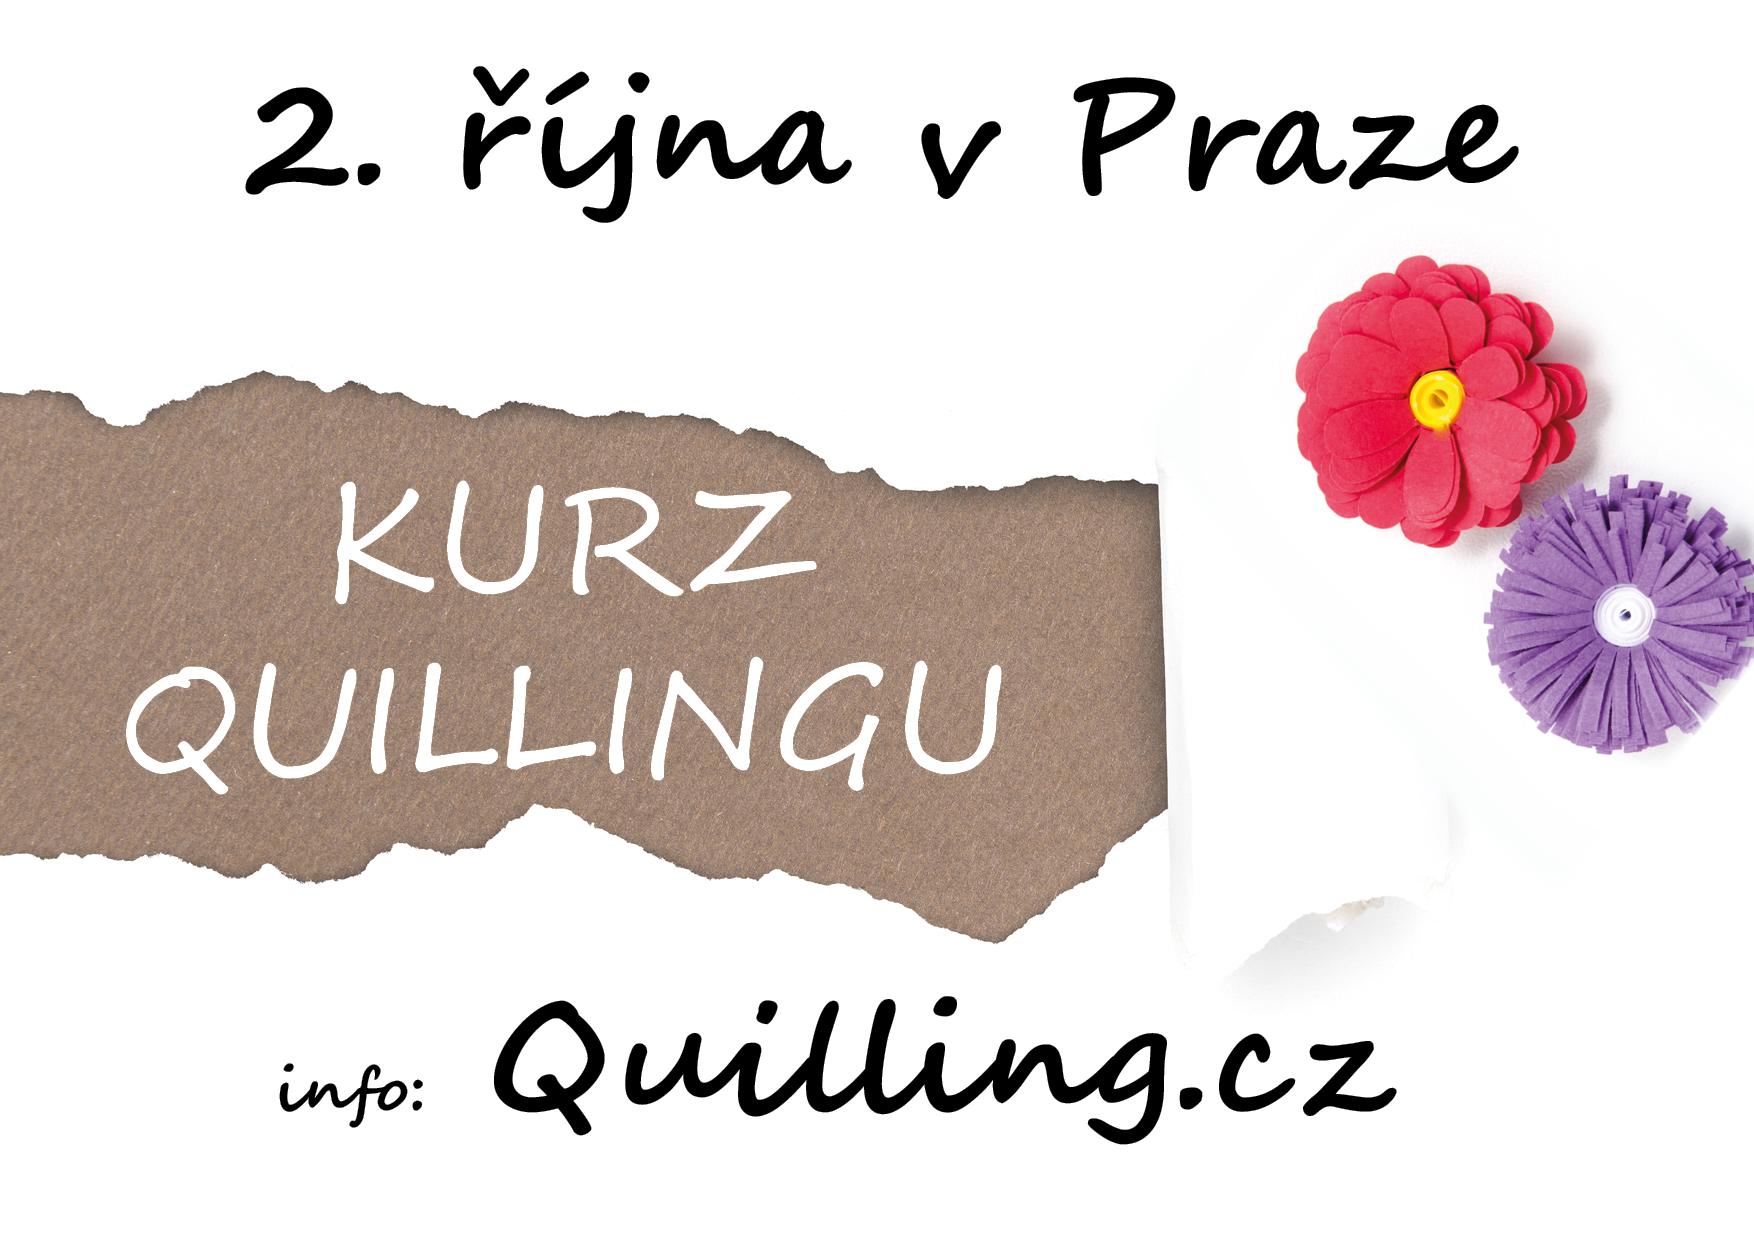 Kurz quillingu v Praze